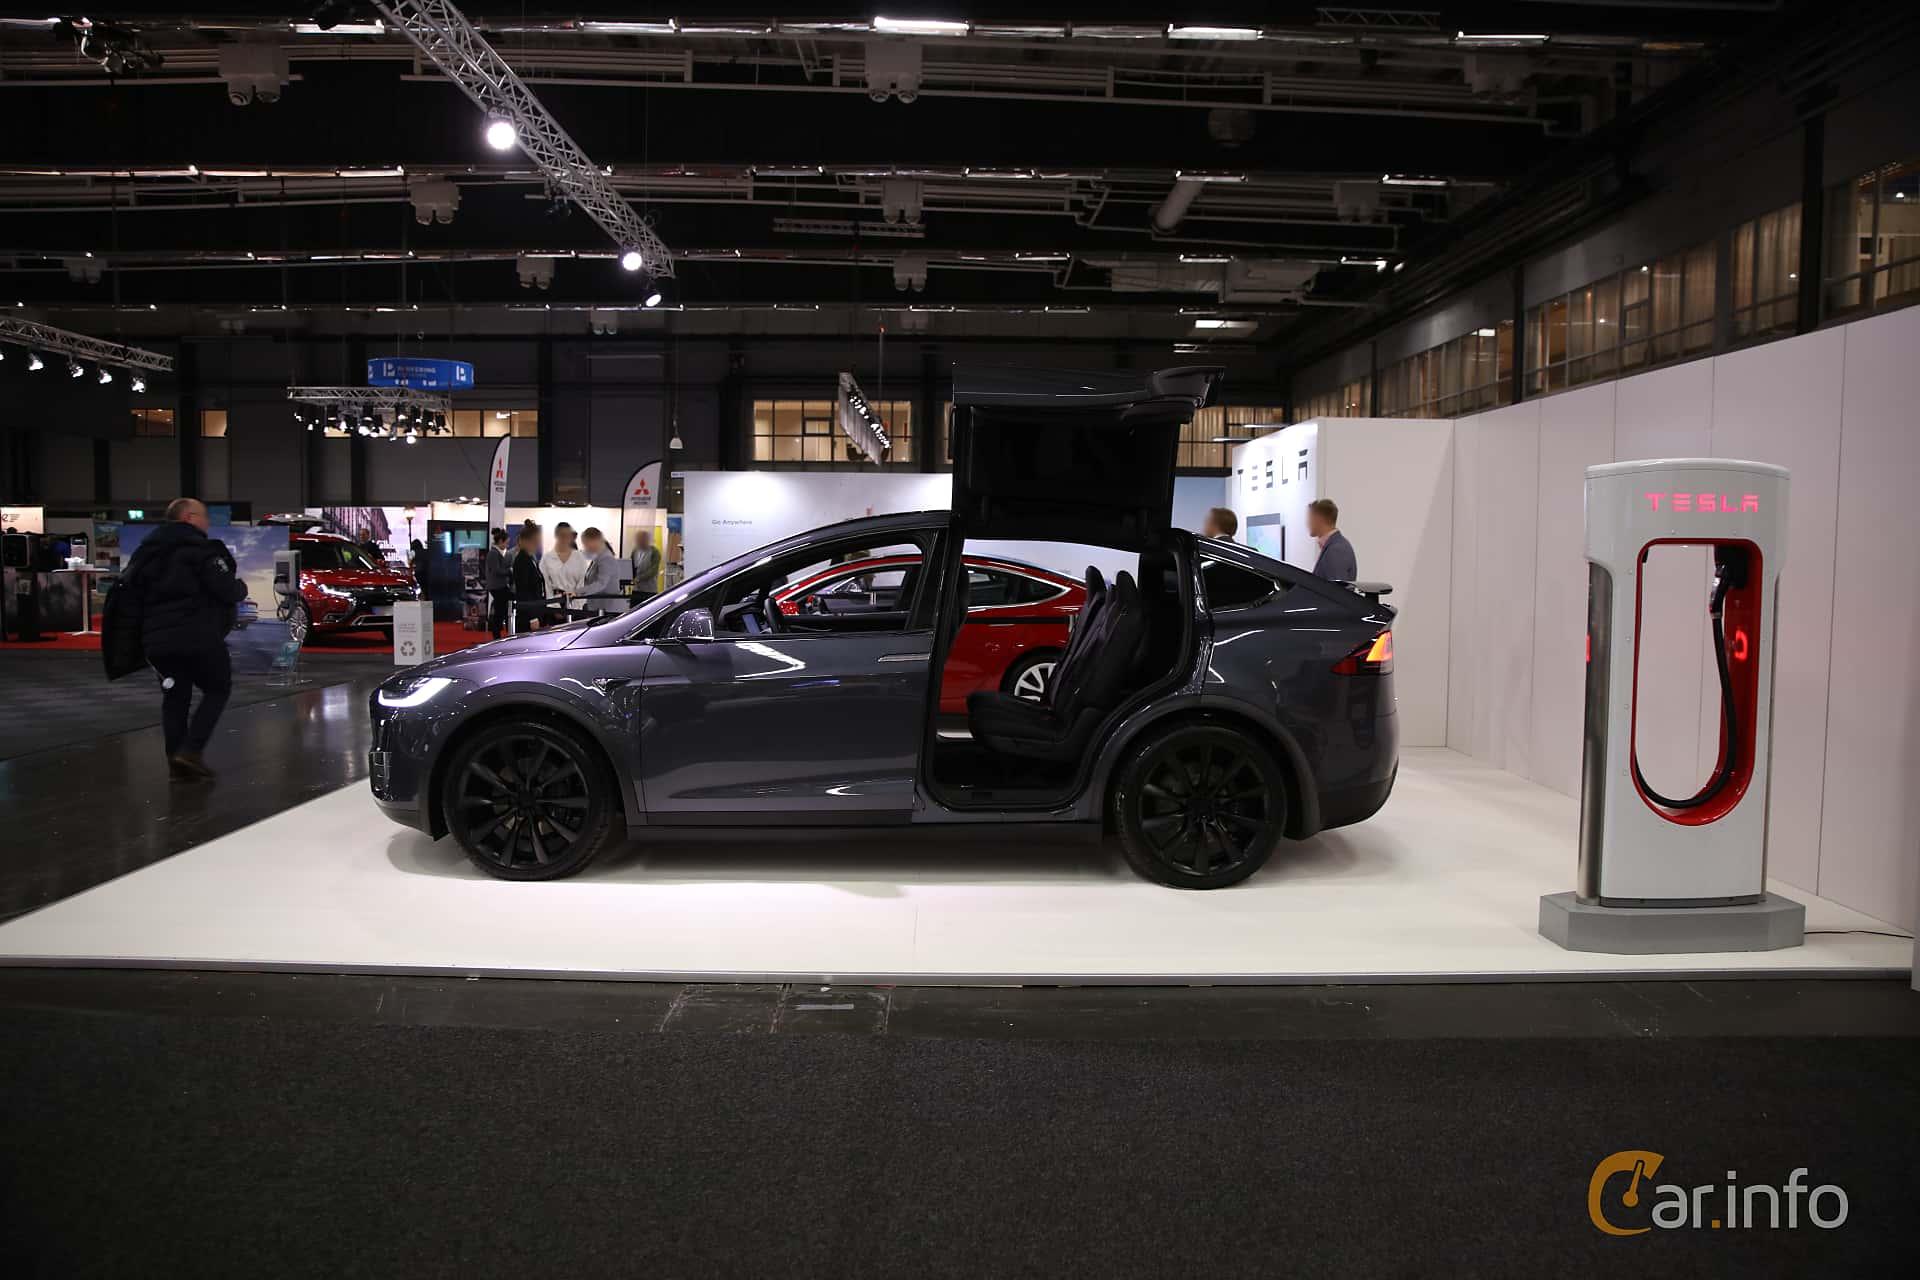 Tesla Model X 100D 100 kWh AWD Single Speed, 423hp, 2018 at eCar Expo Göteborg 2018